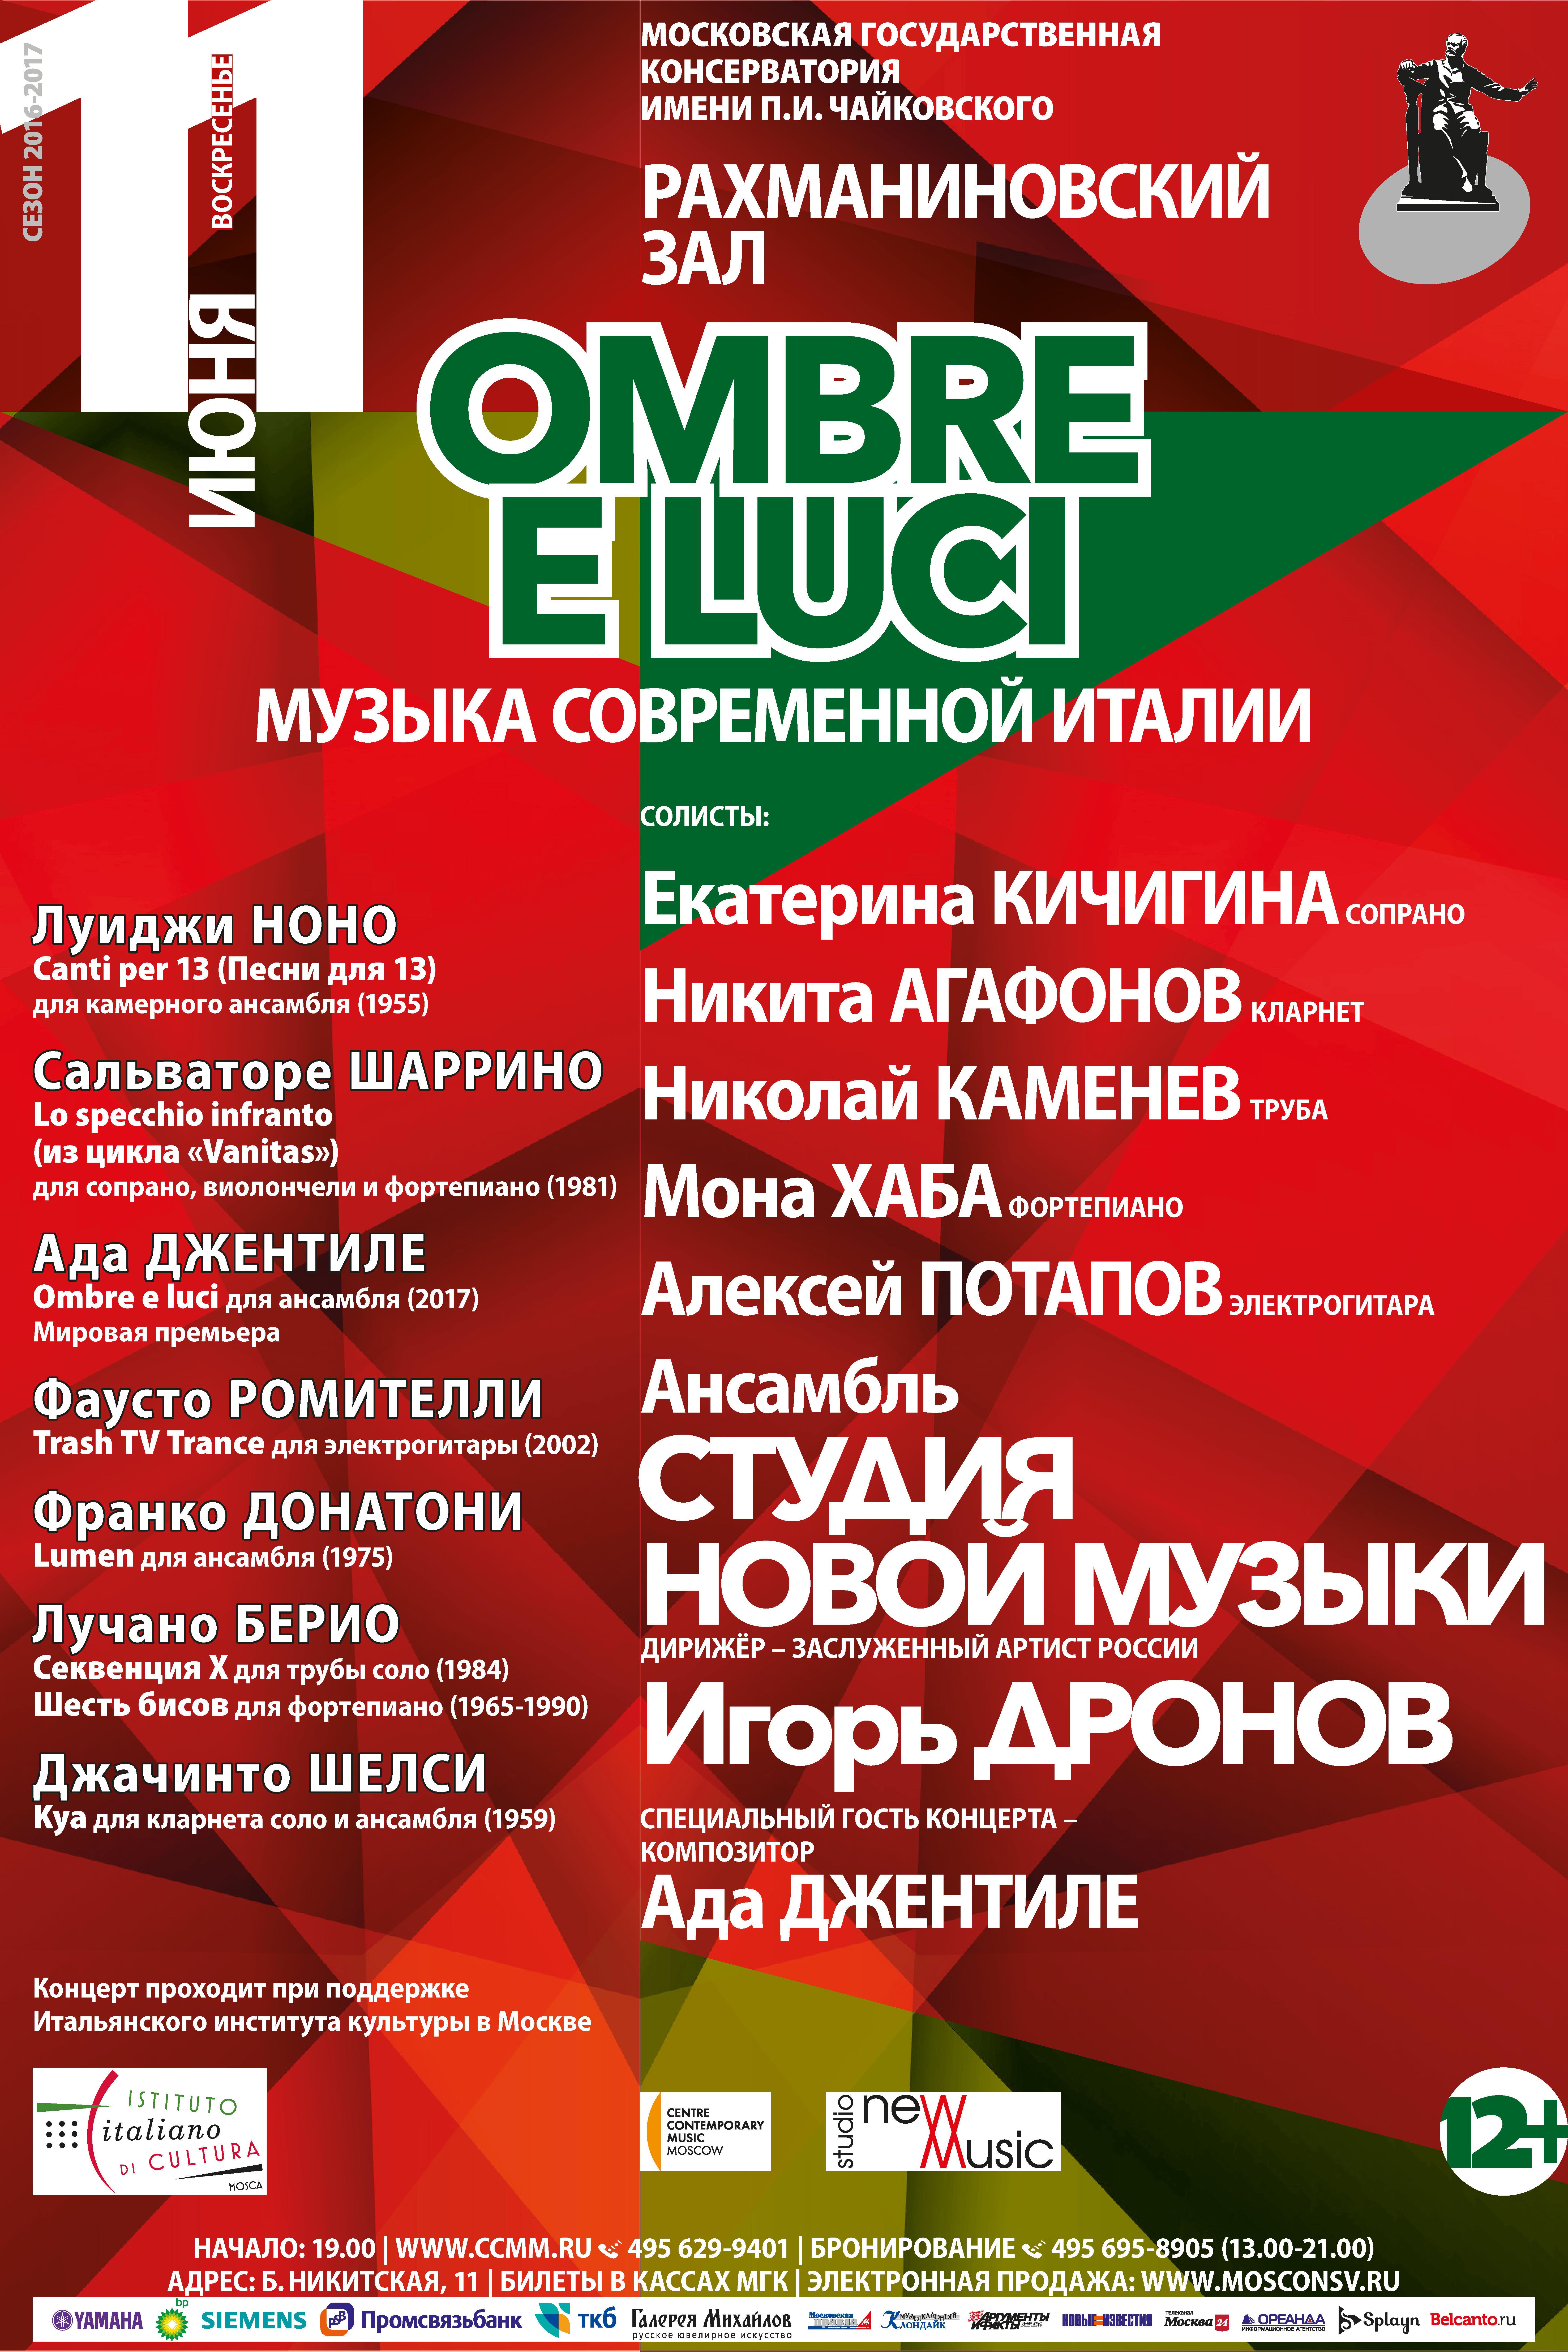 Annuncio conc. MOSCA